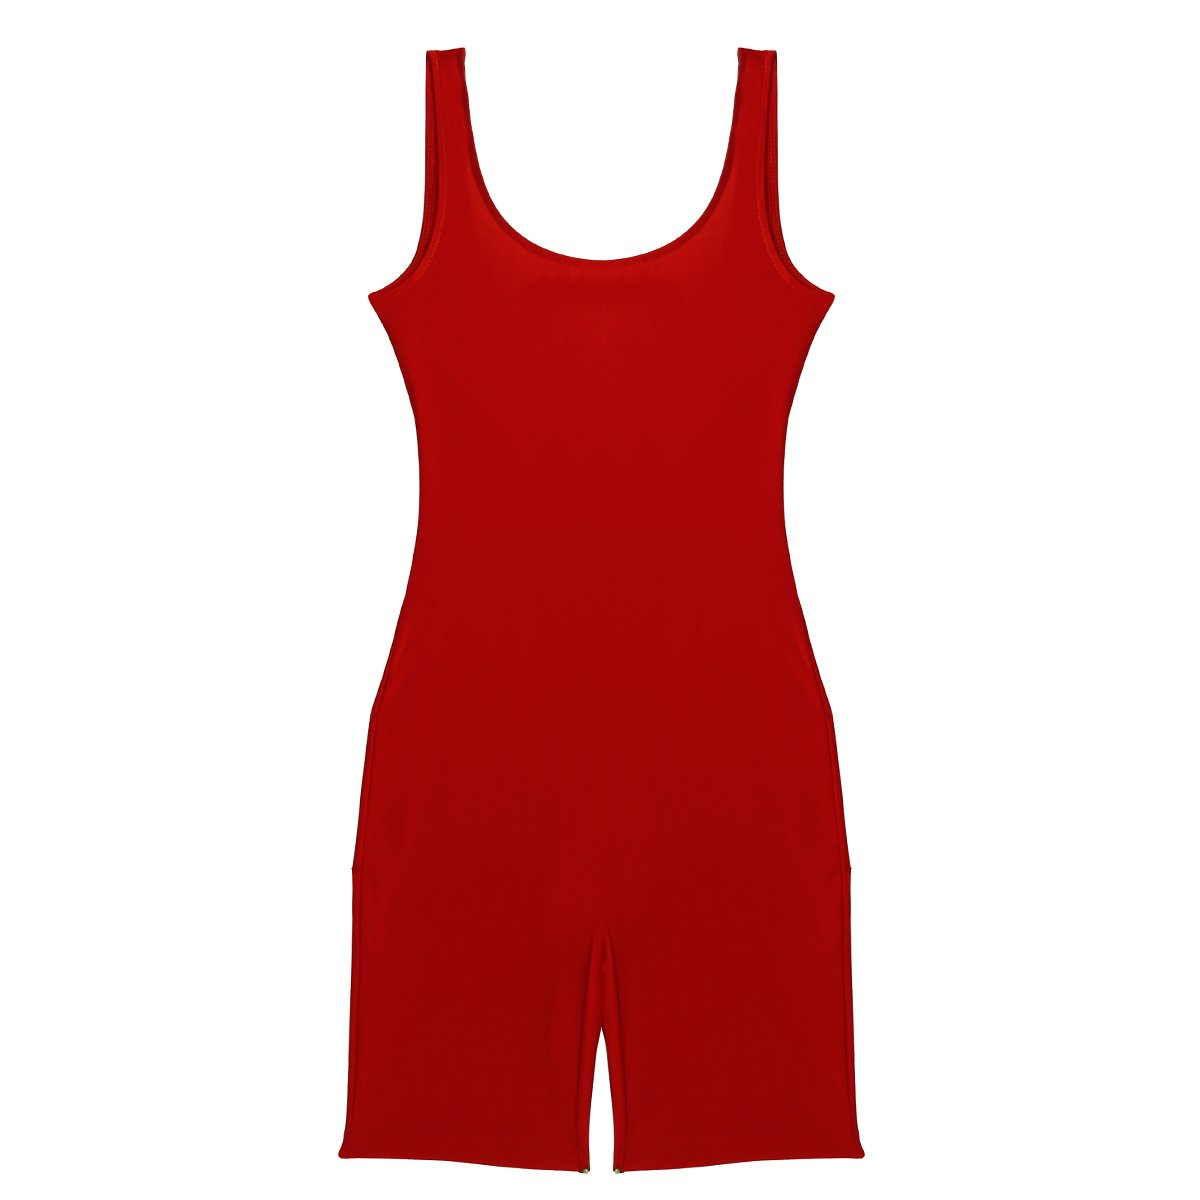 easyforever Womens Skinny Tank Leotard Athletic Sports Knee Length Active Yoga Unitard Bodysuit